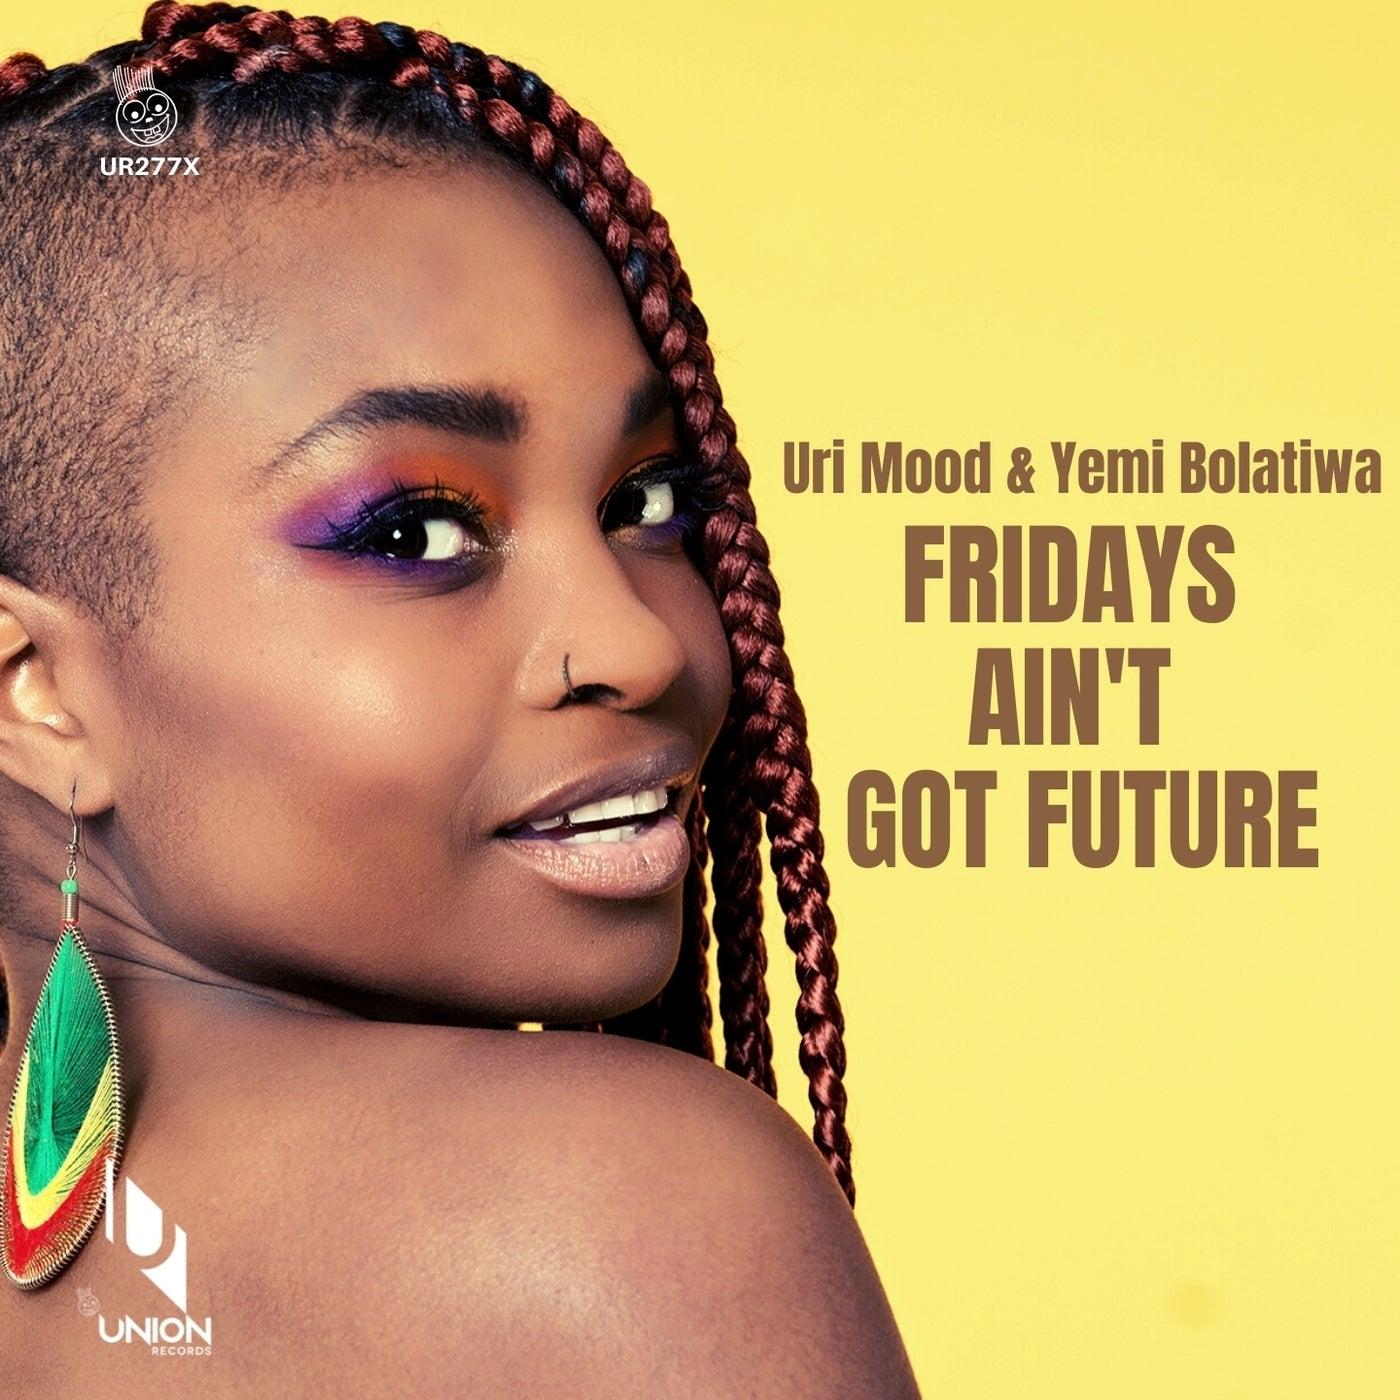 Fridays Ain't Got Future (Original Mix)